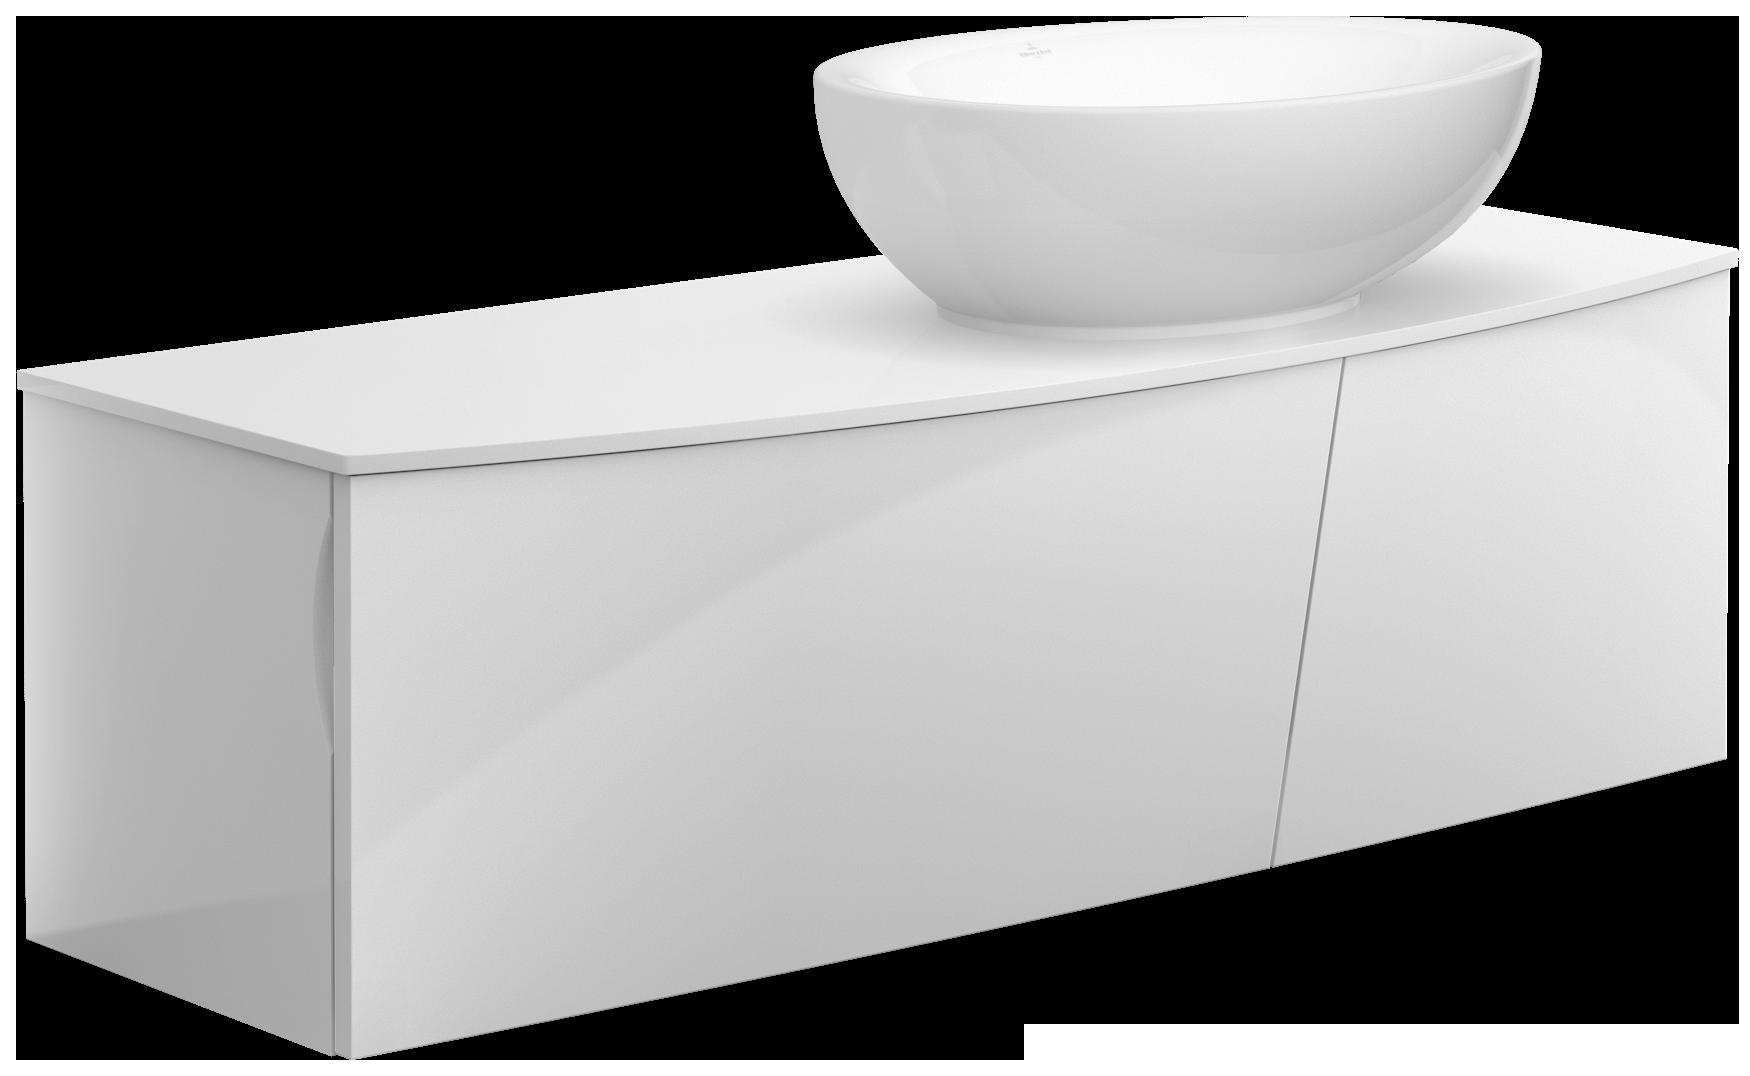 Aveo new generation meuble sous lavabo a844e2   villeroy & boch